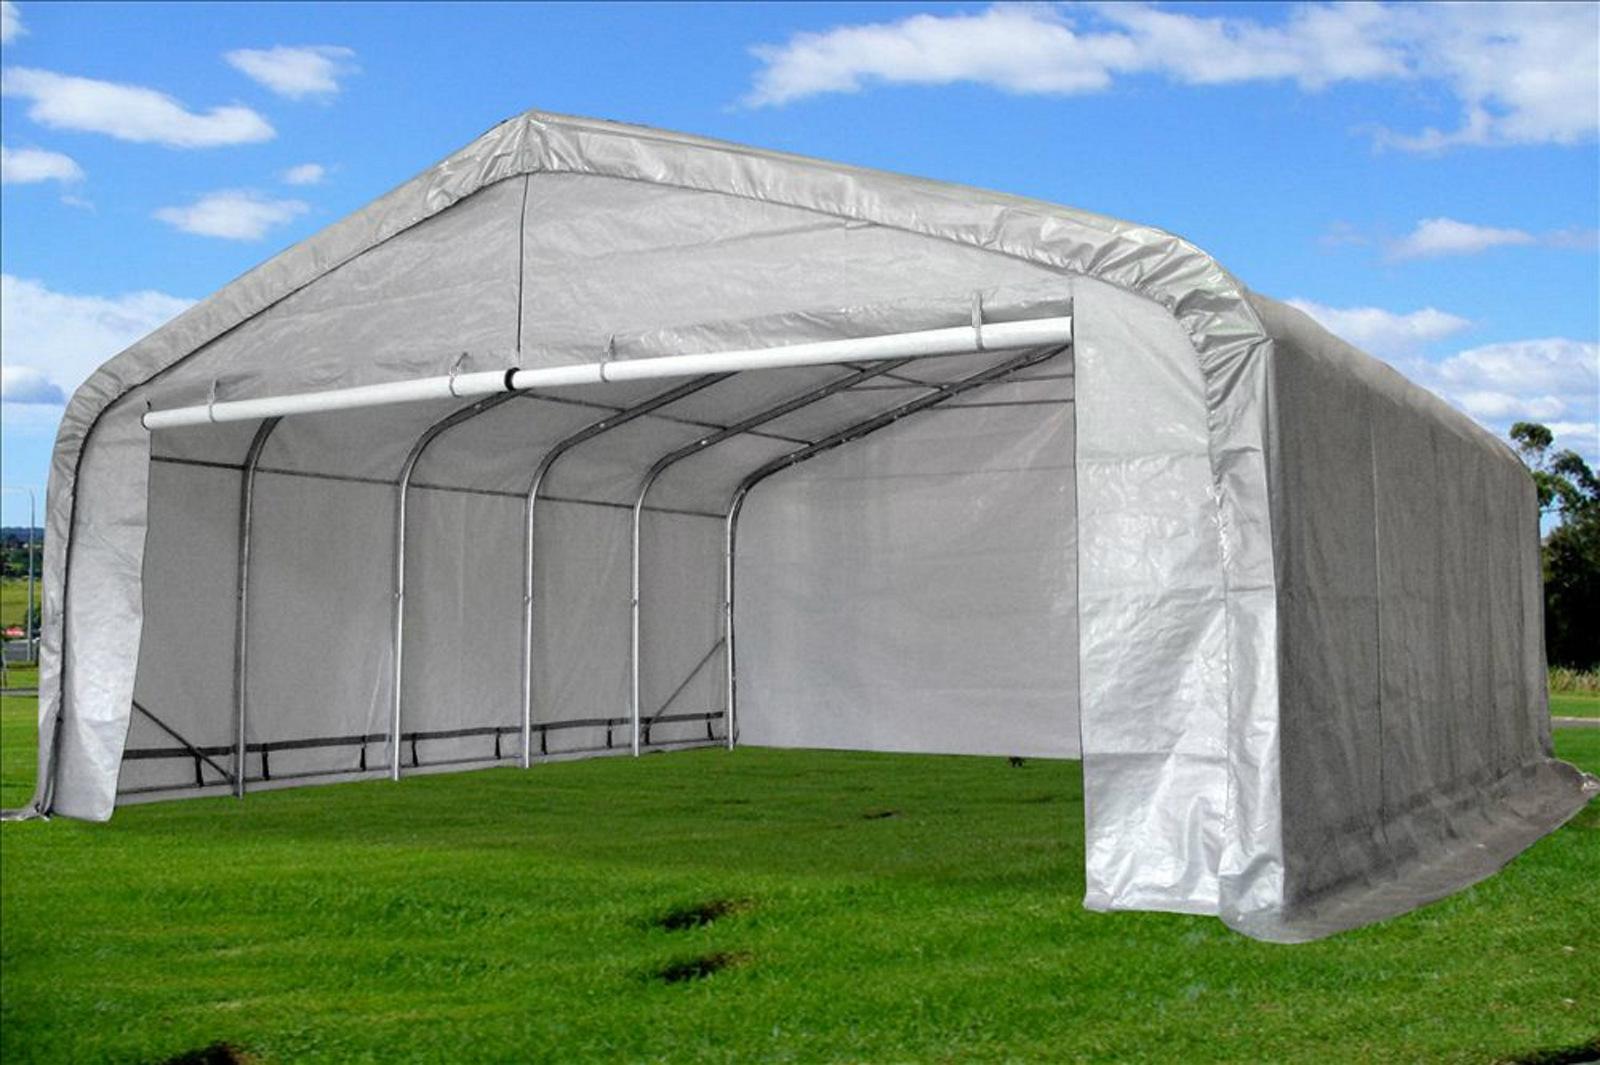 Canopies And Storage : Carport x garage storage canopy shed triangular top